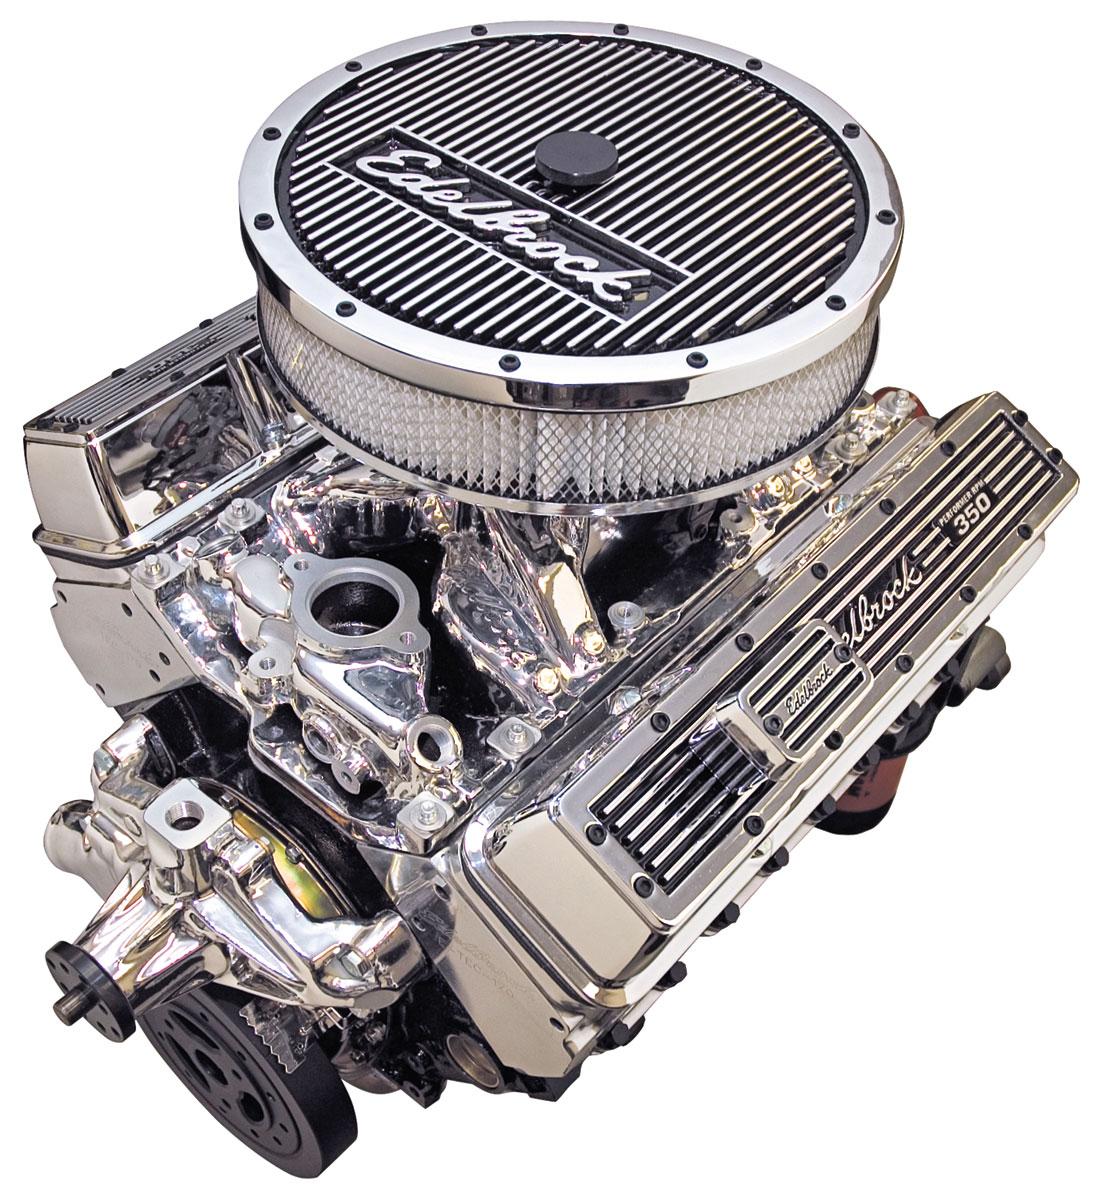 Photo of Crate Engine, Performer RPM E-Tec, Edelbrock Short Water Pump EnduraShine